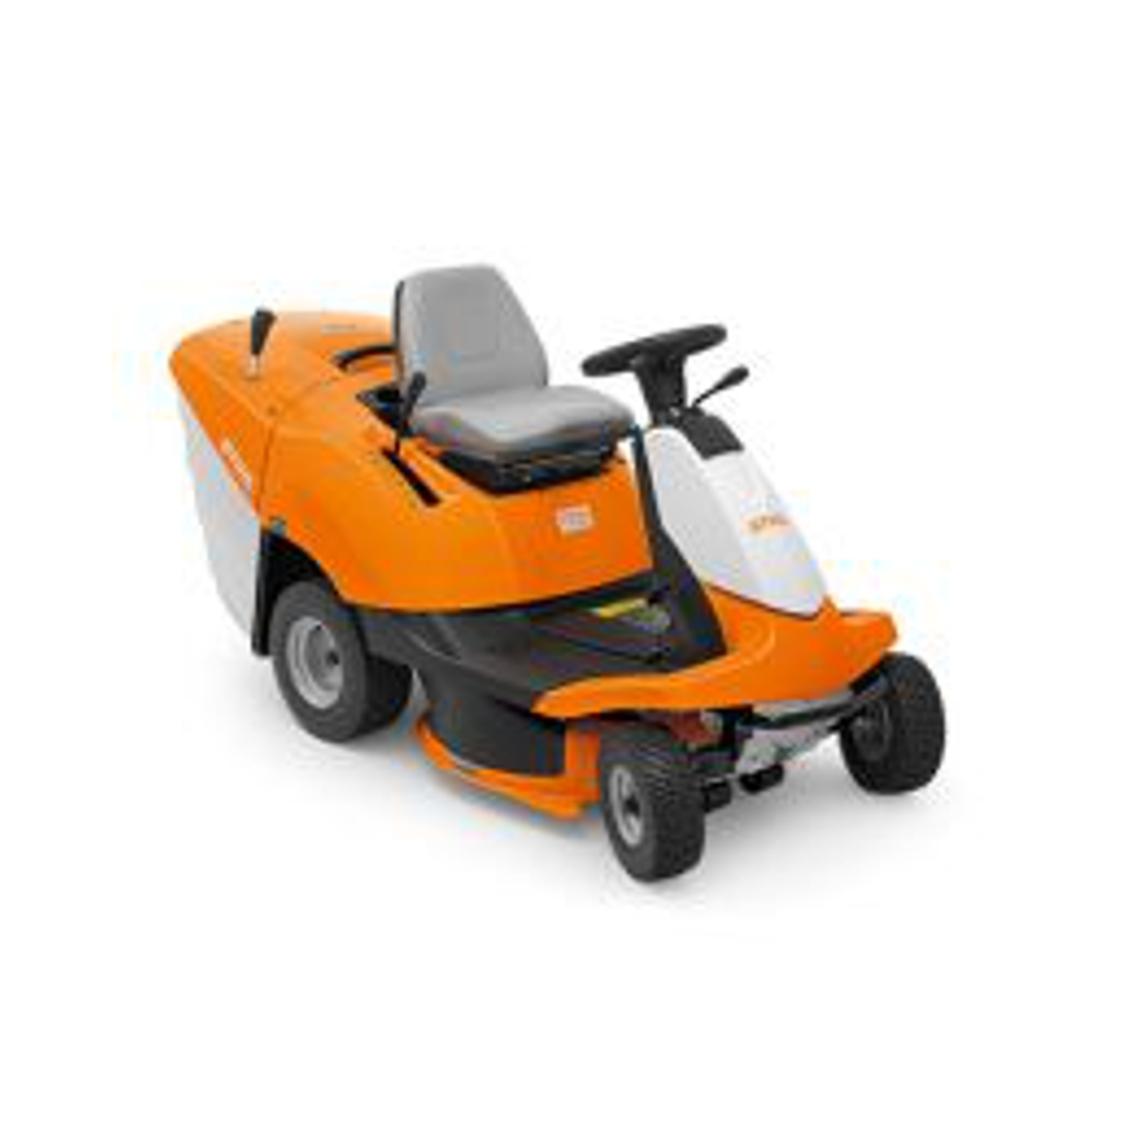 Stihl Ride on Mower Parts